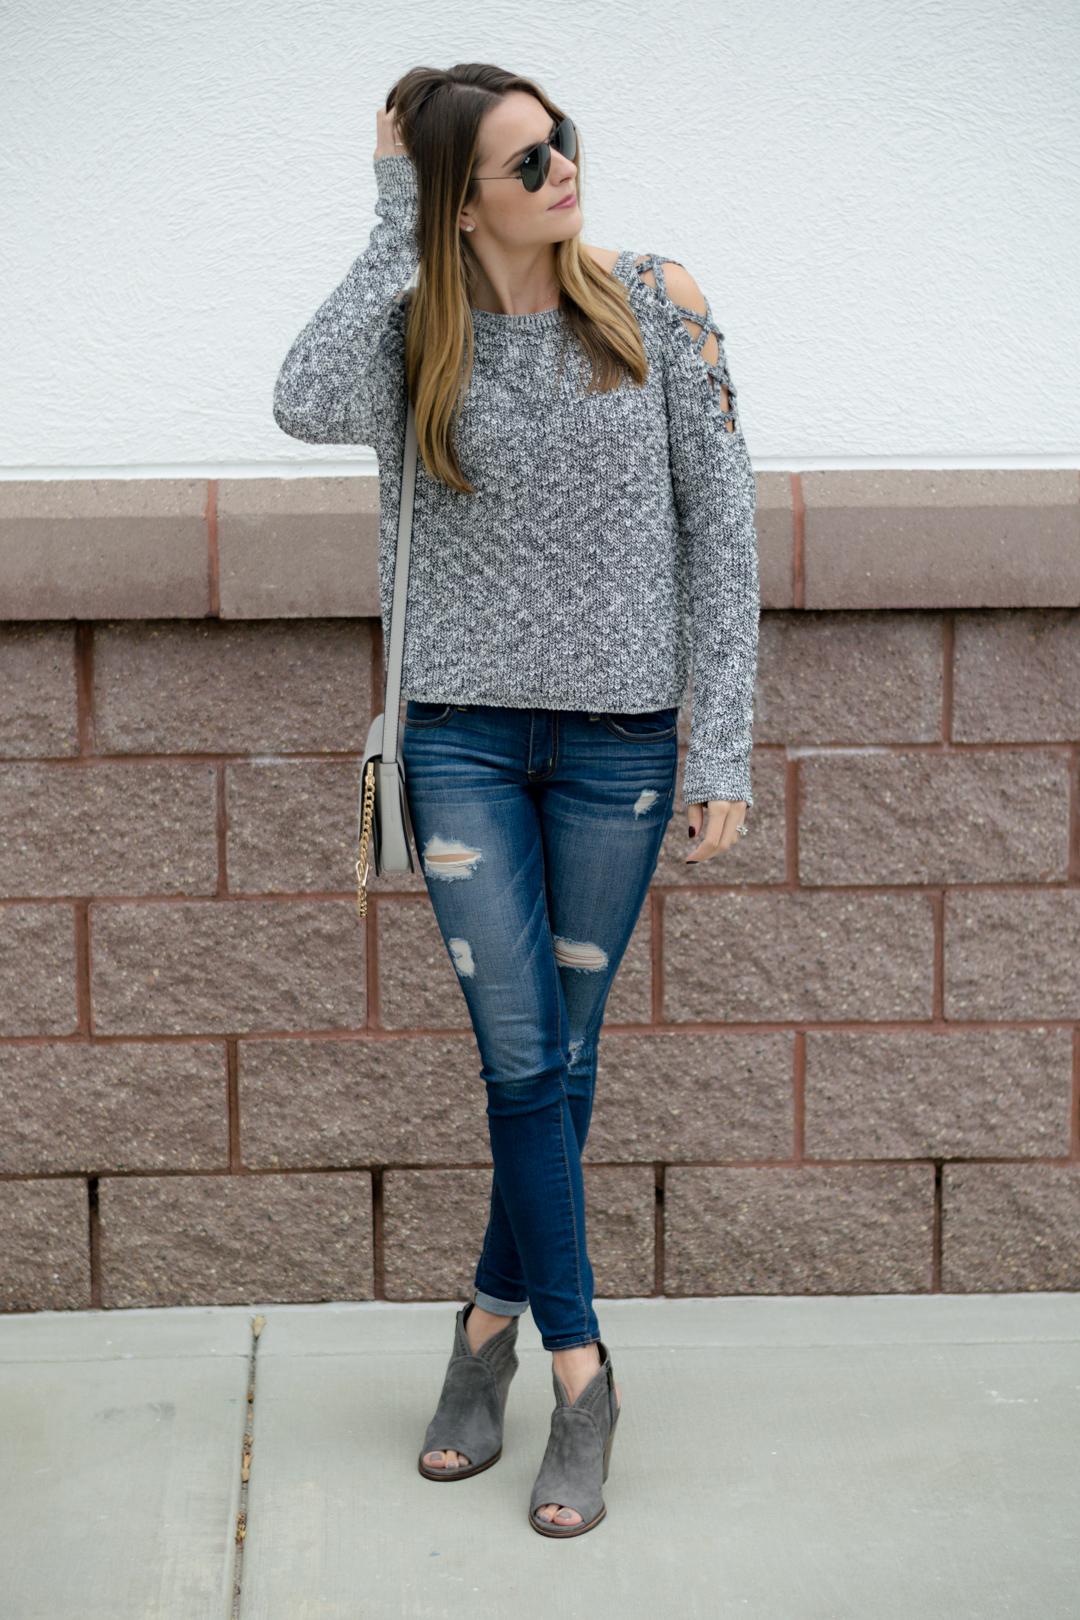 8e1d5e220e Lace-Up Cold Shoulder Sweater - The Styled Press